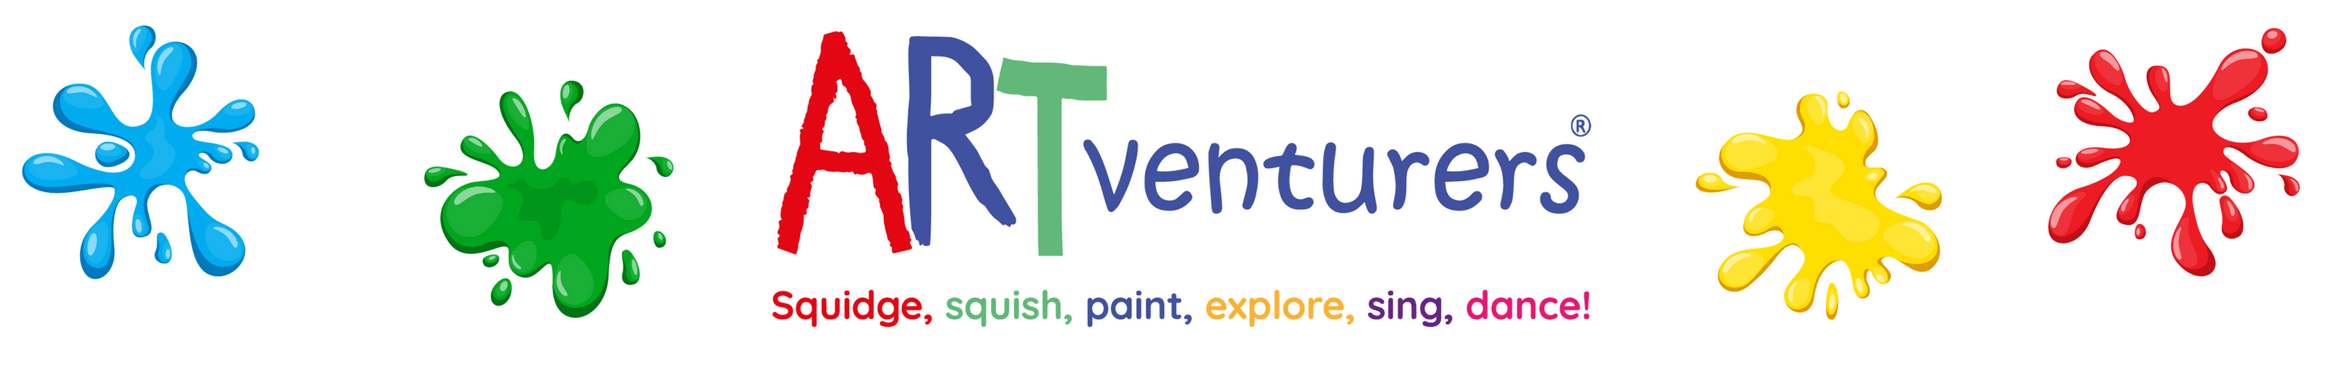 ARTventurers Mansfield, Southwell and Sutton-in-Ashfield